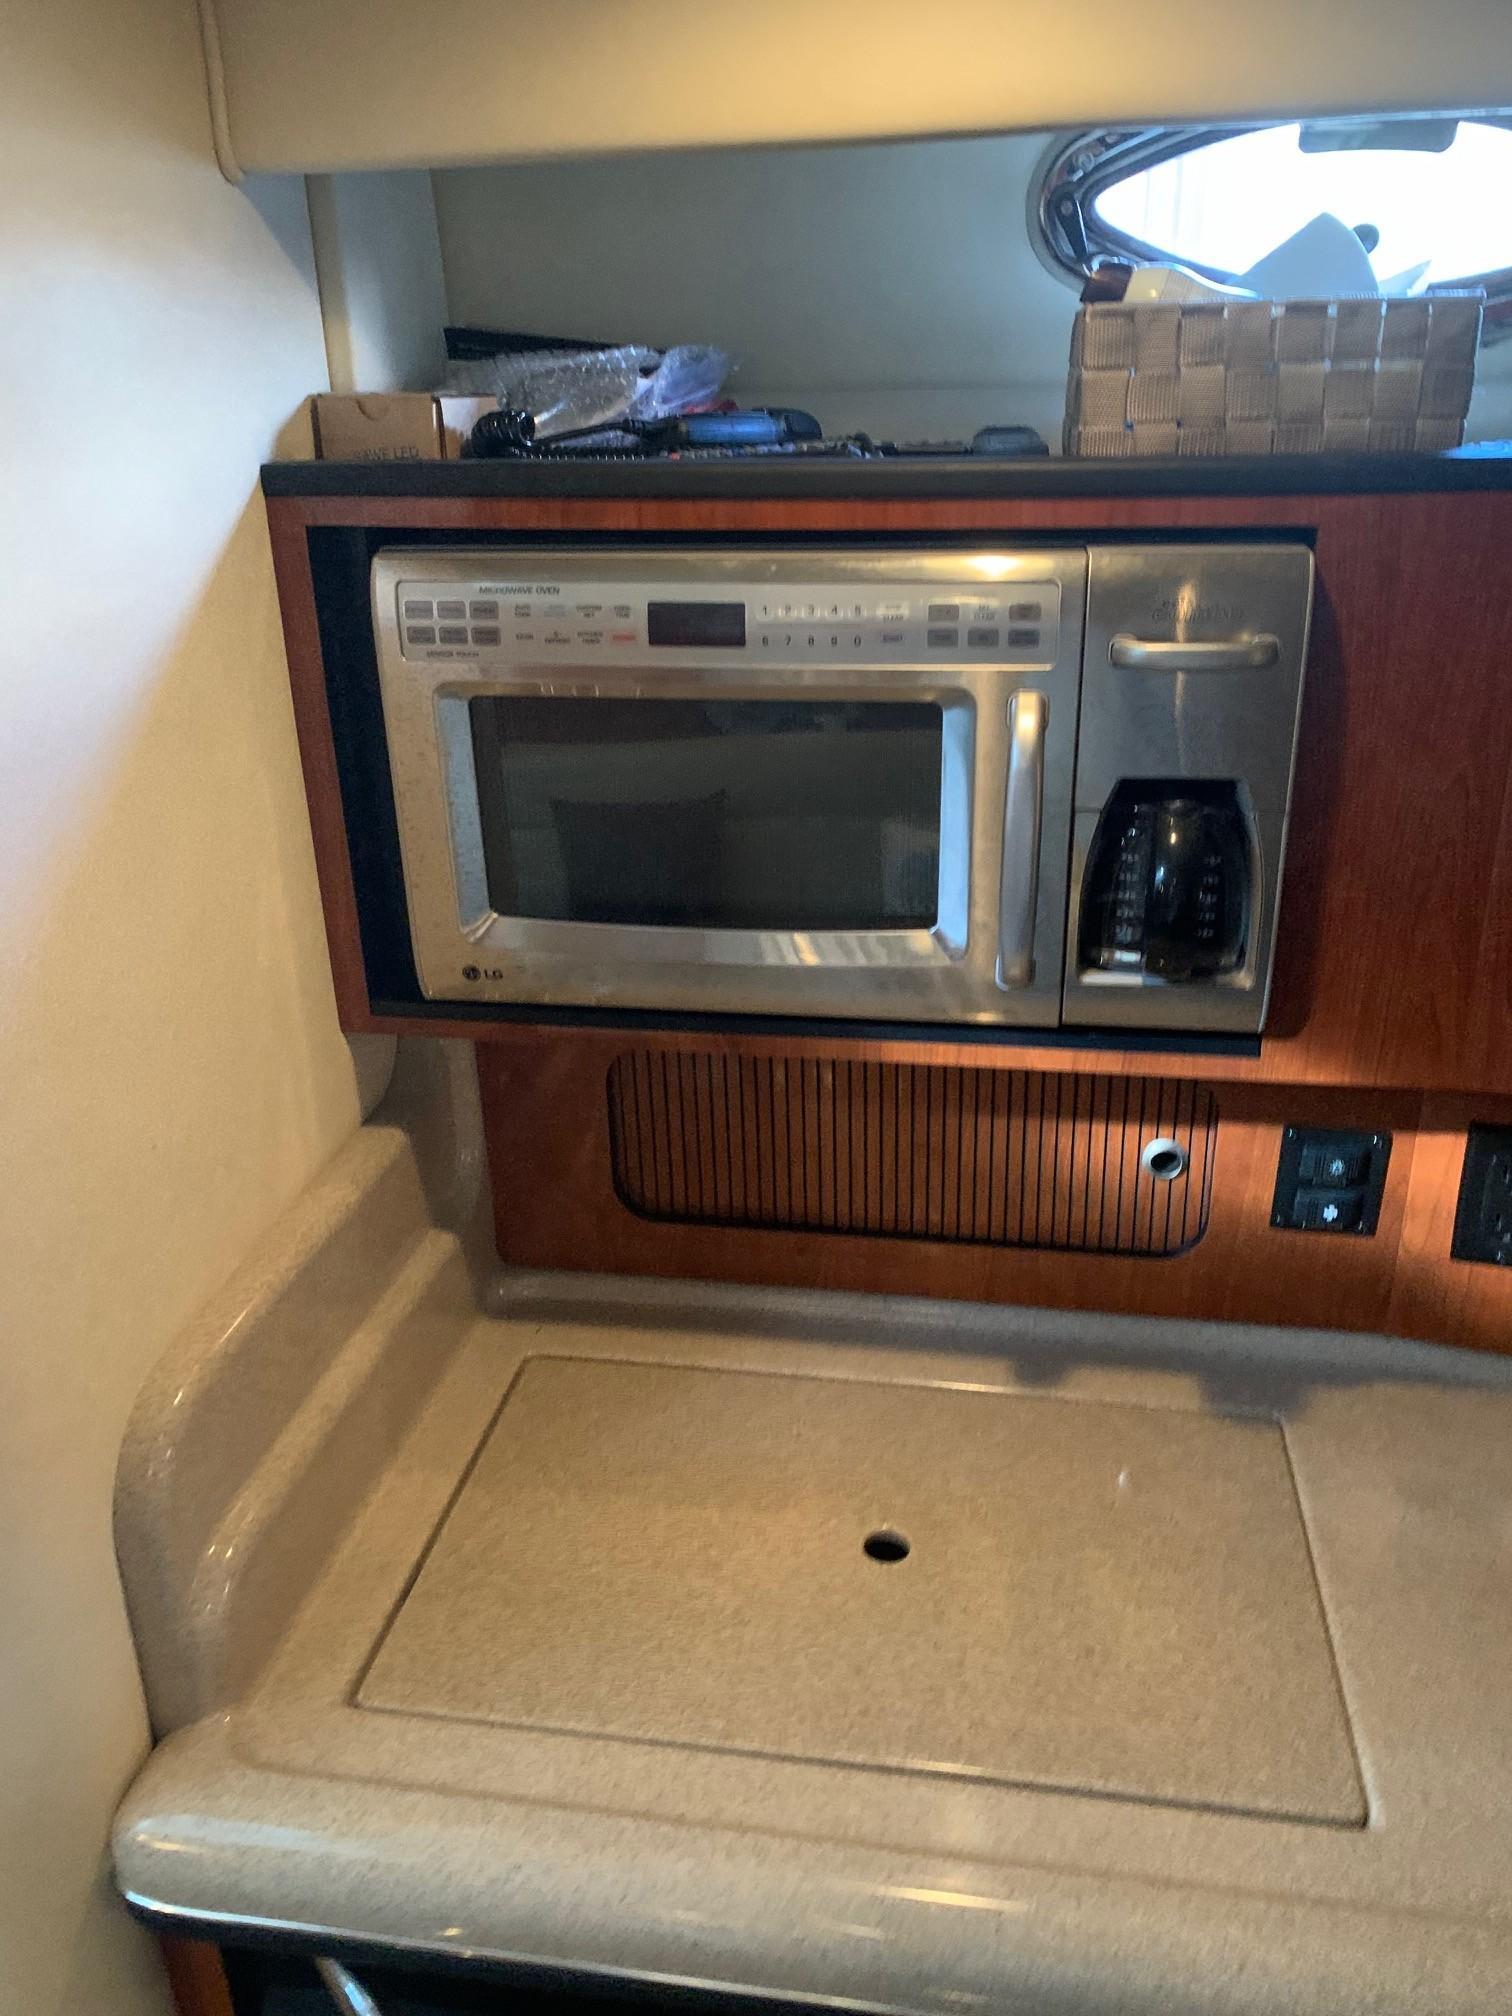 Sea Ray 320 Sundancer - Microwave